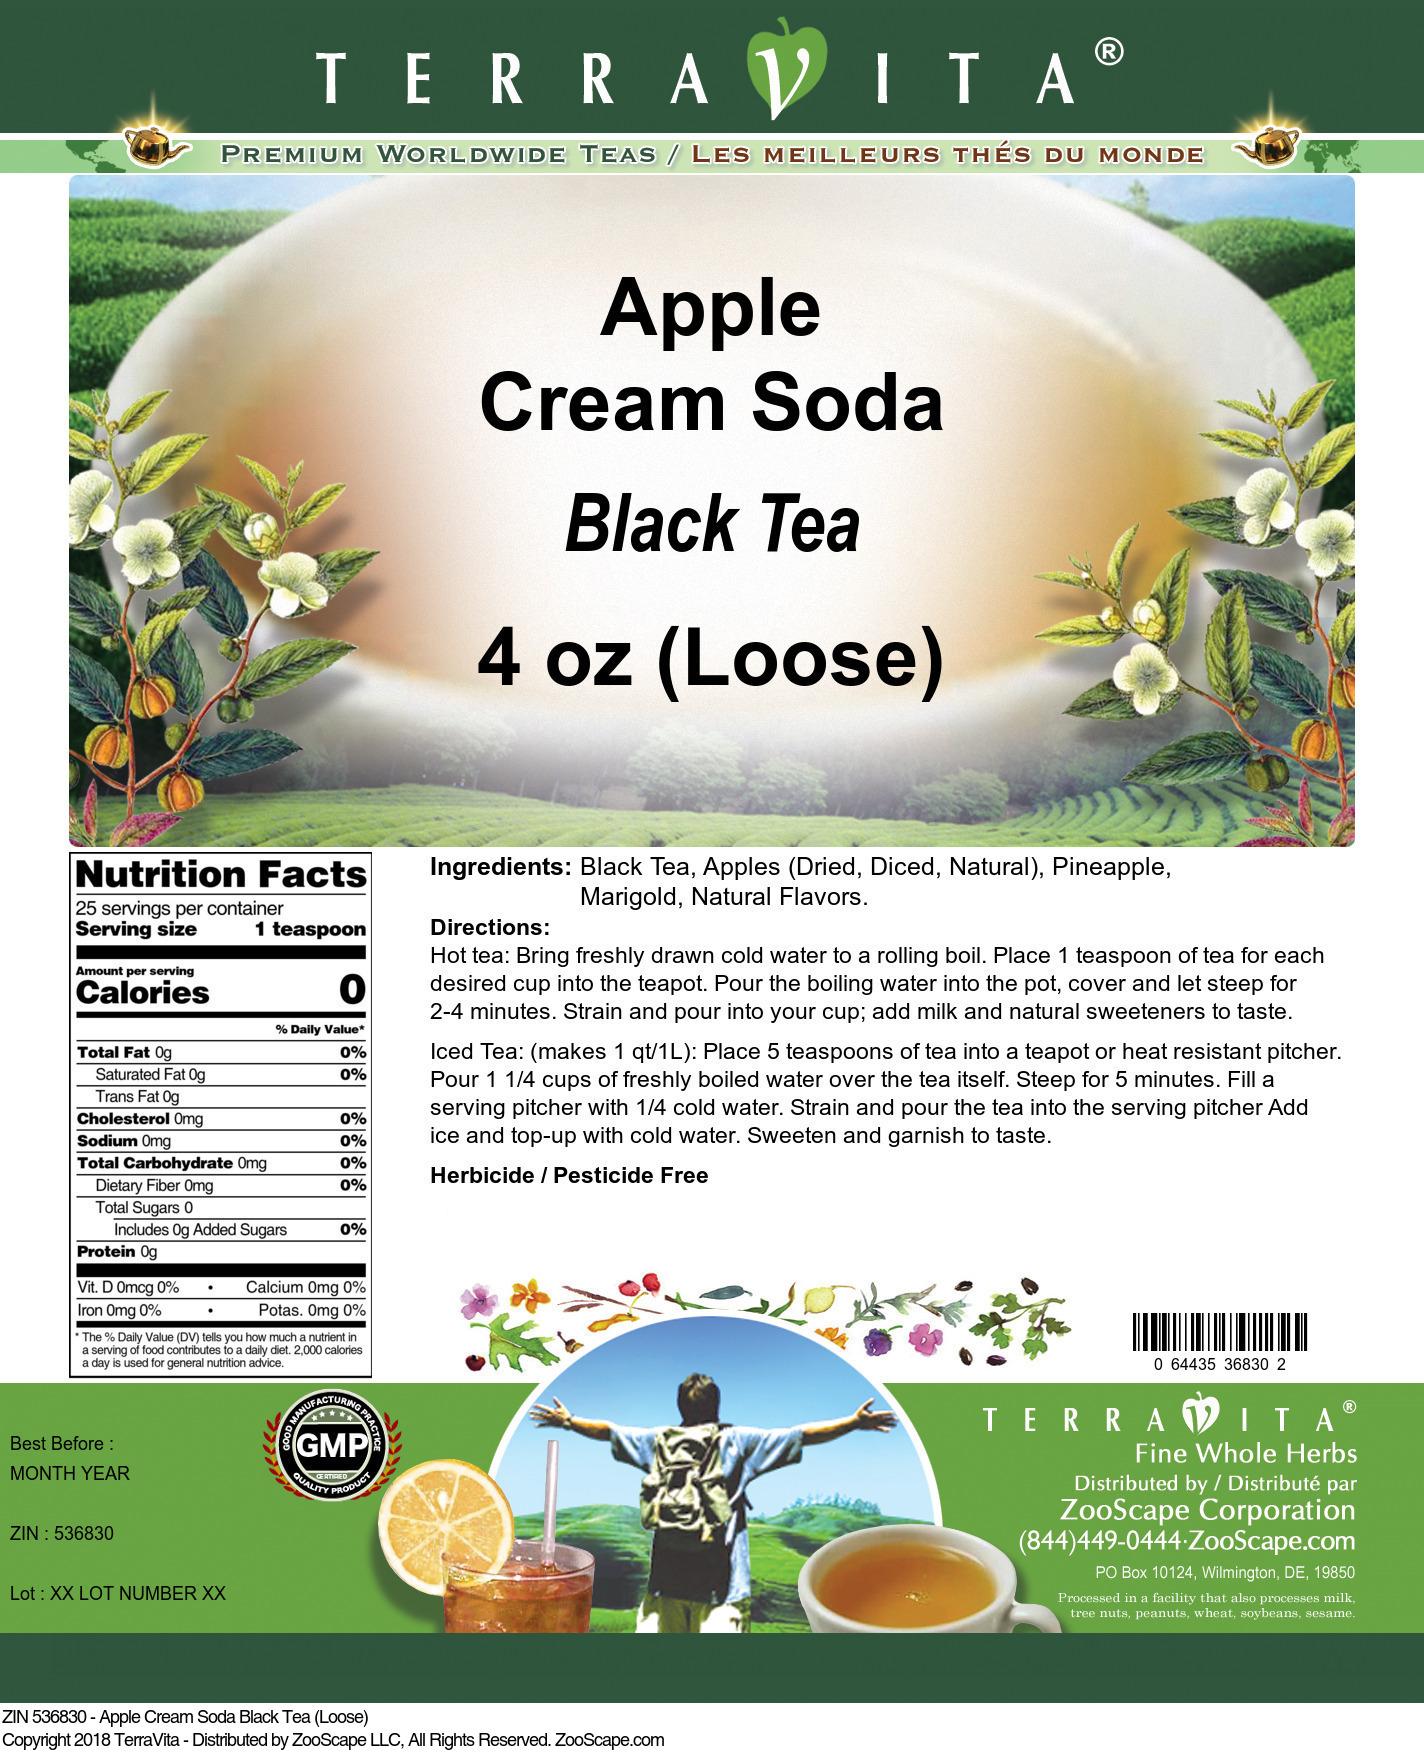 Apple Cream Soda Black Tea (Loose)